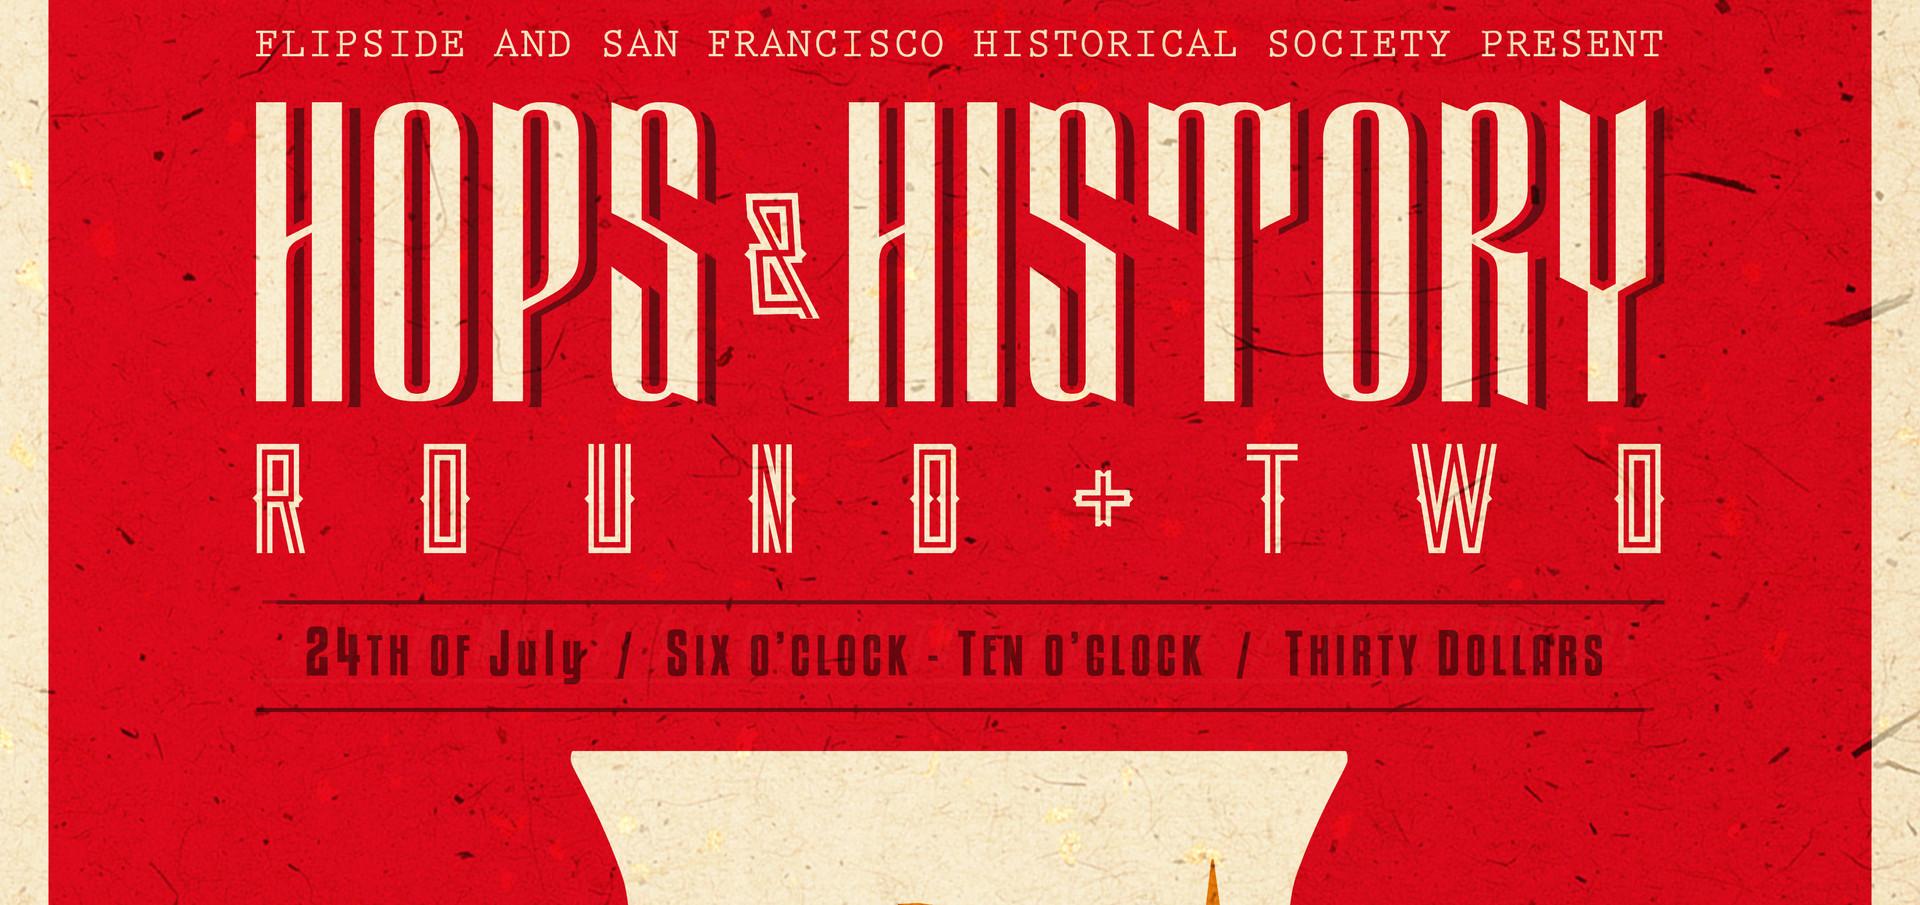 HOPS & HISTORY